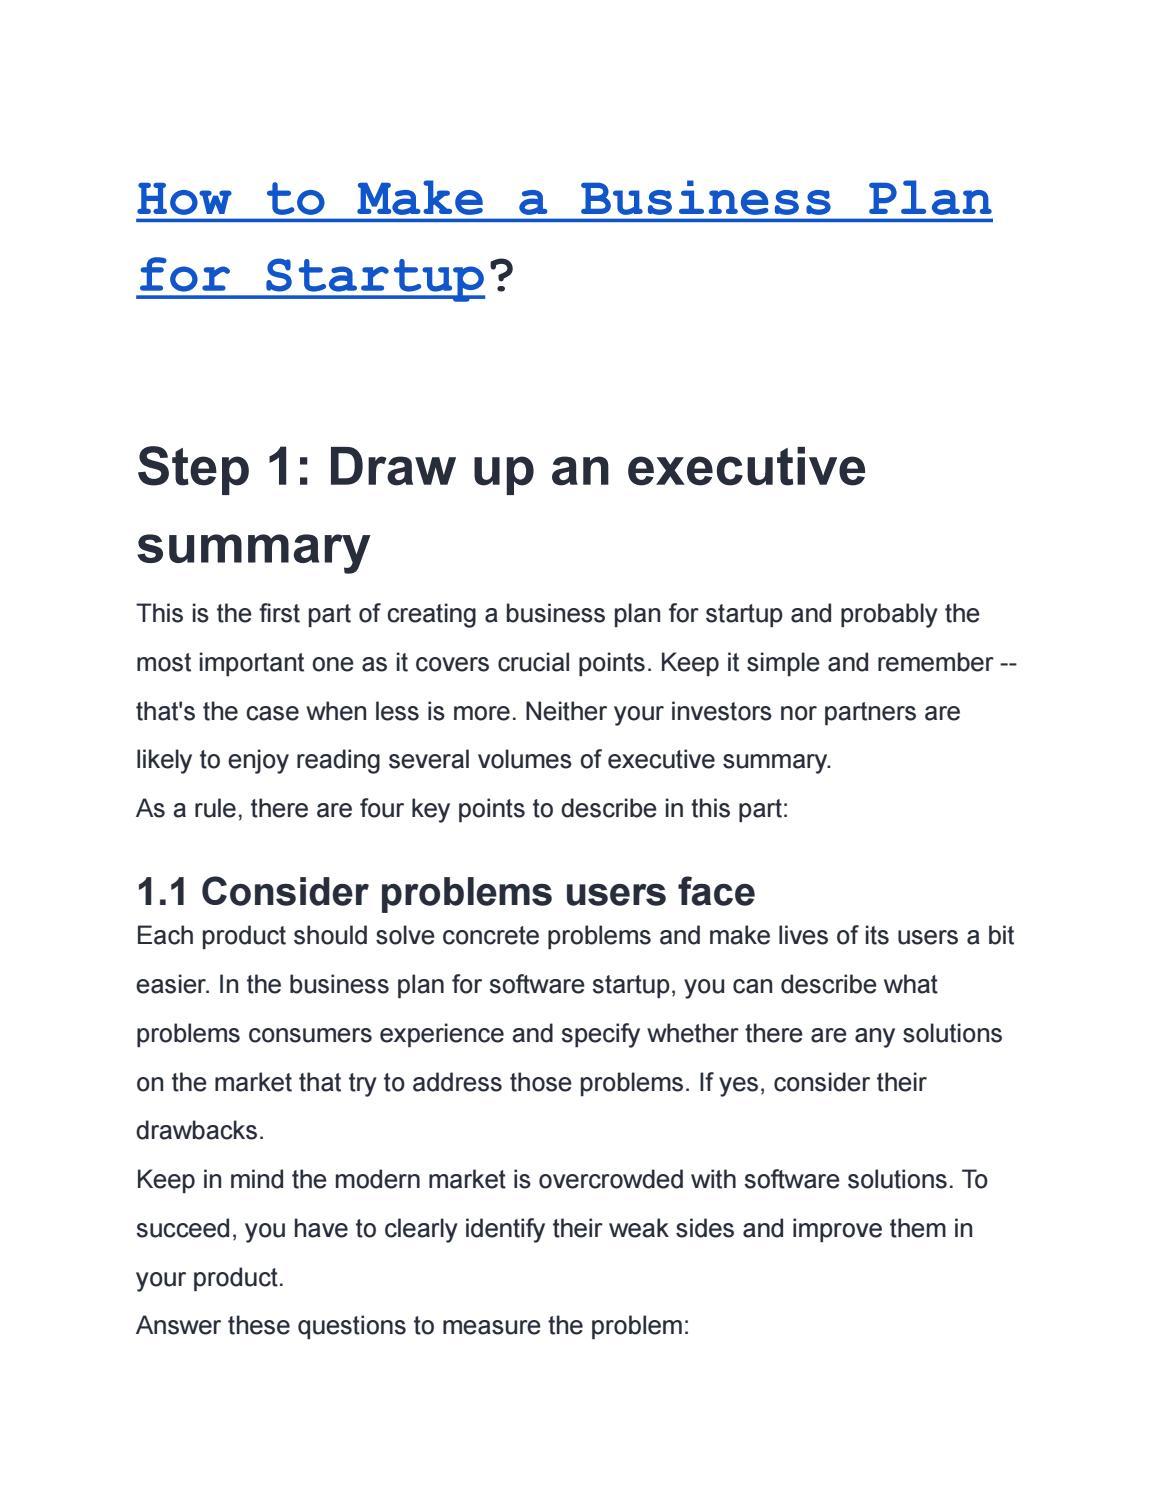 Business plan software start up custom university assignment samples